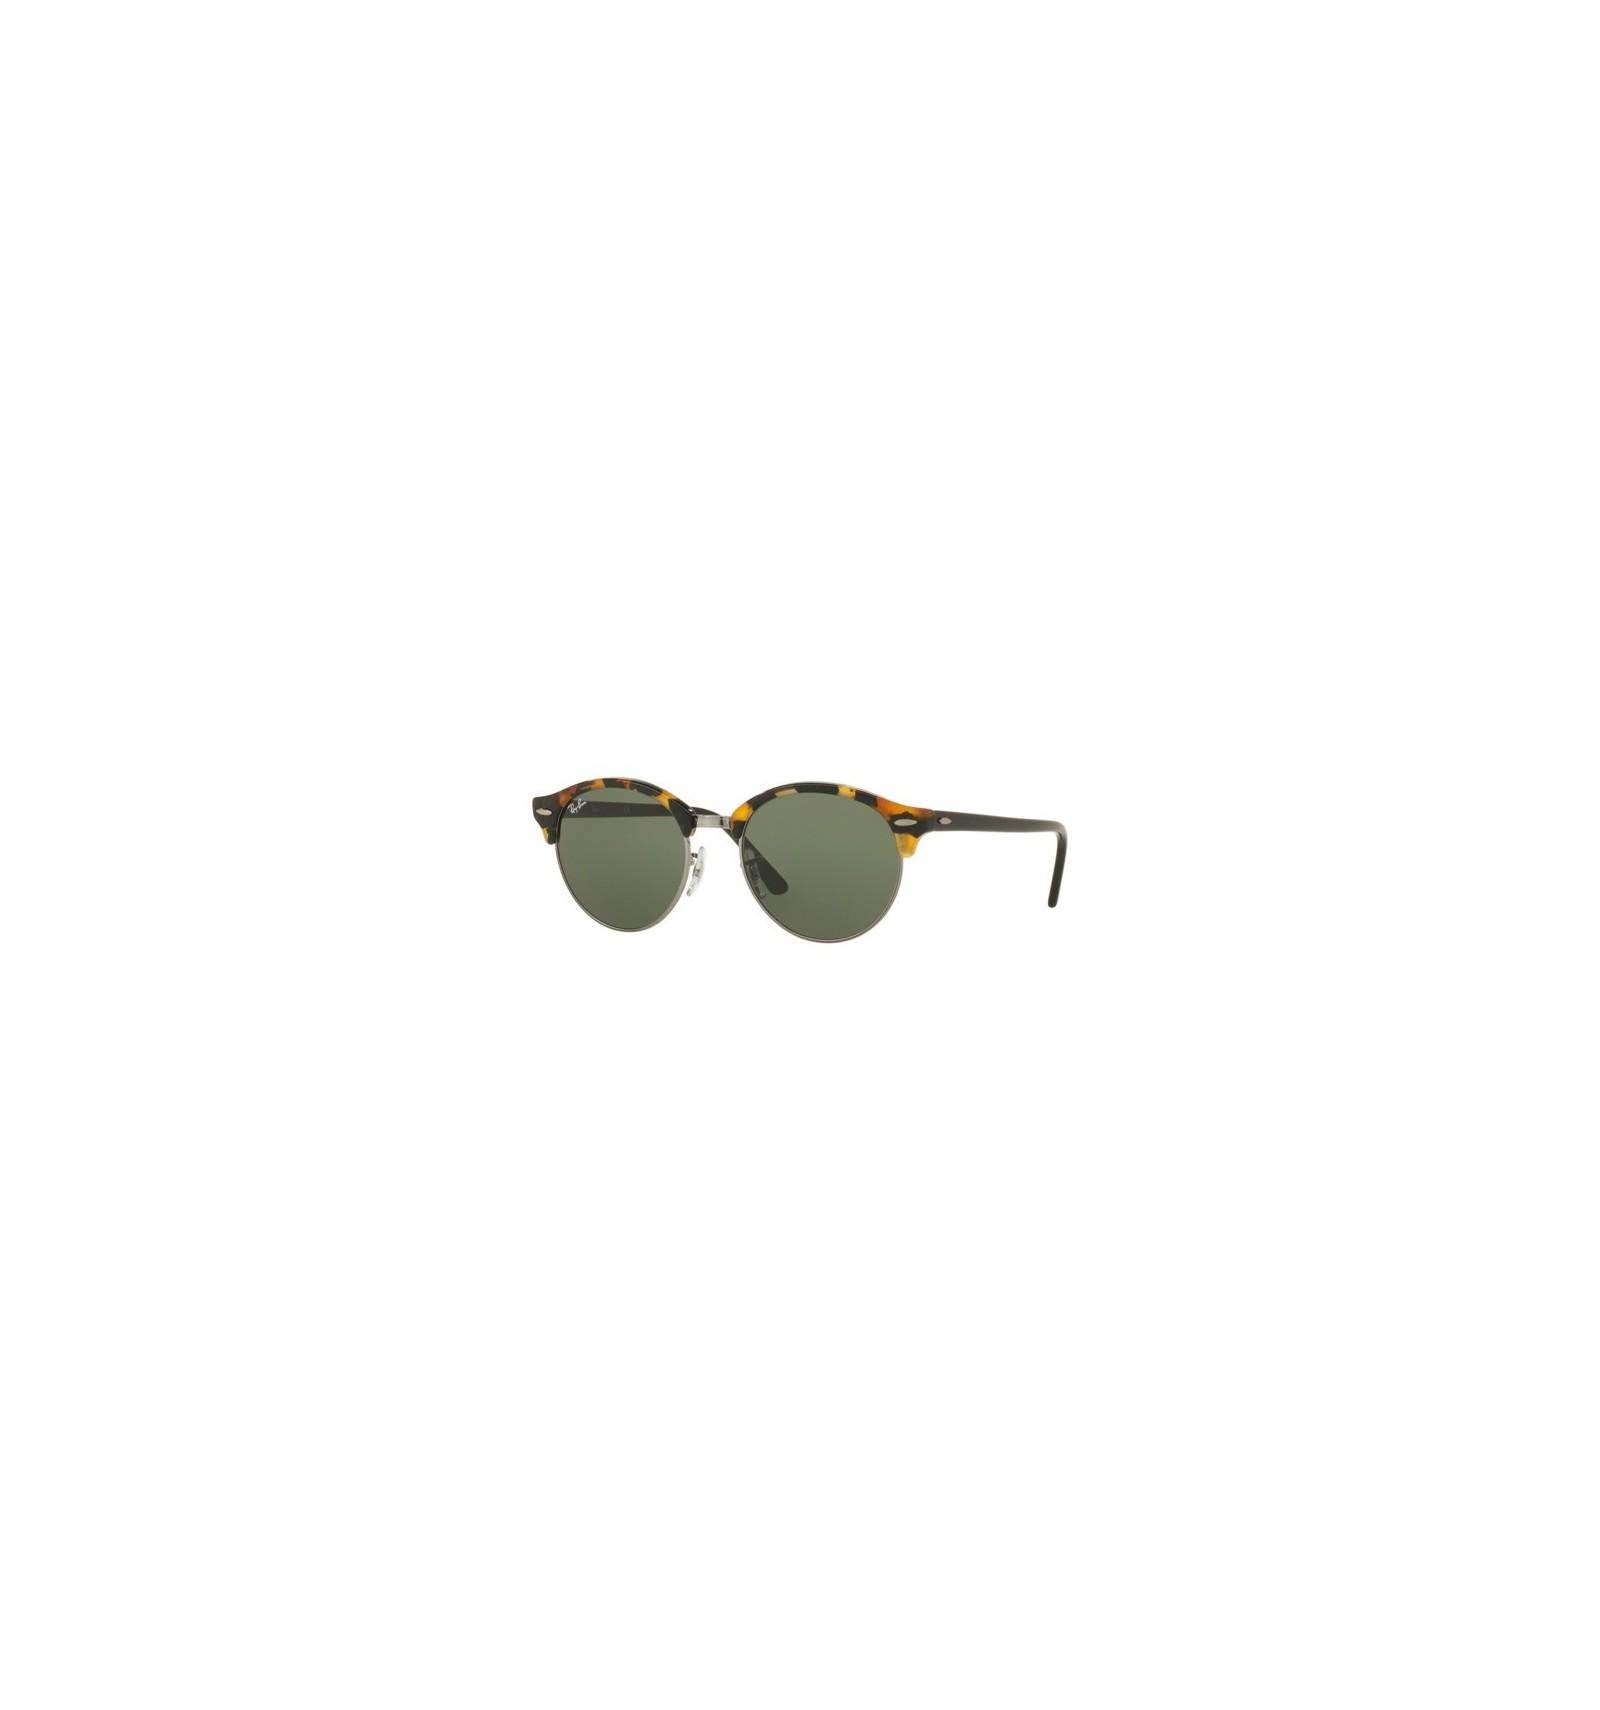 3551518334 Gafas Sol Ray Ban RB4246 Clubround Spotted Black Havana- Envío gratis